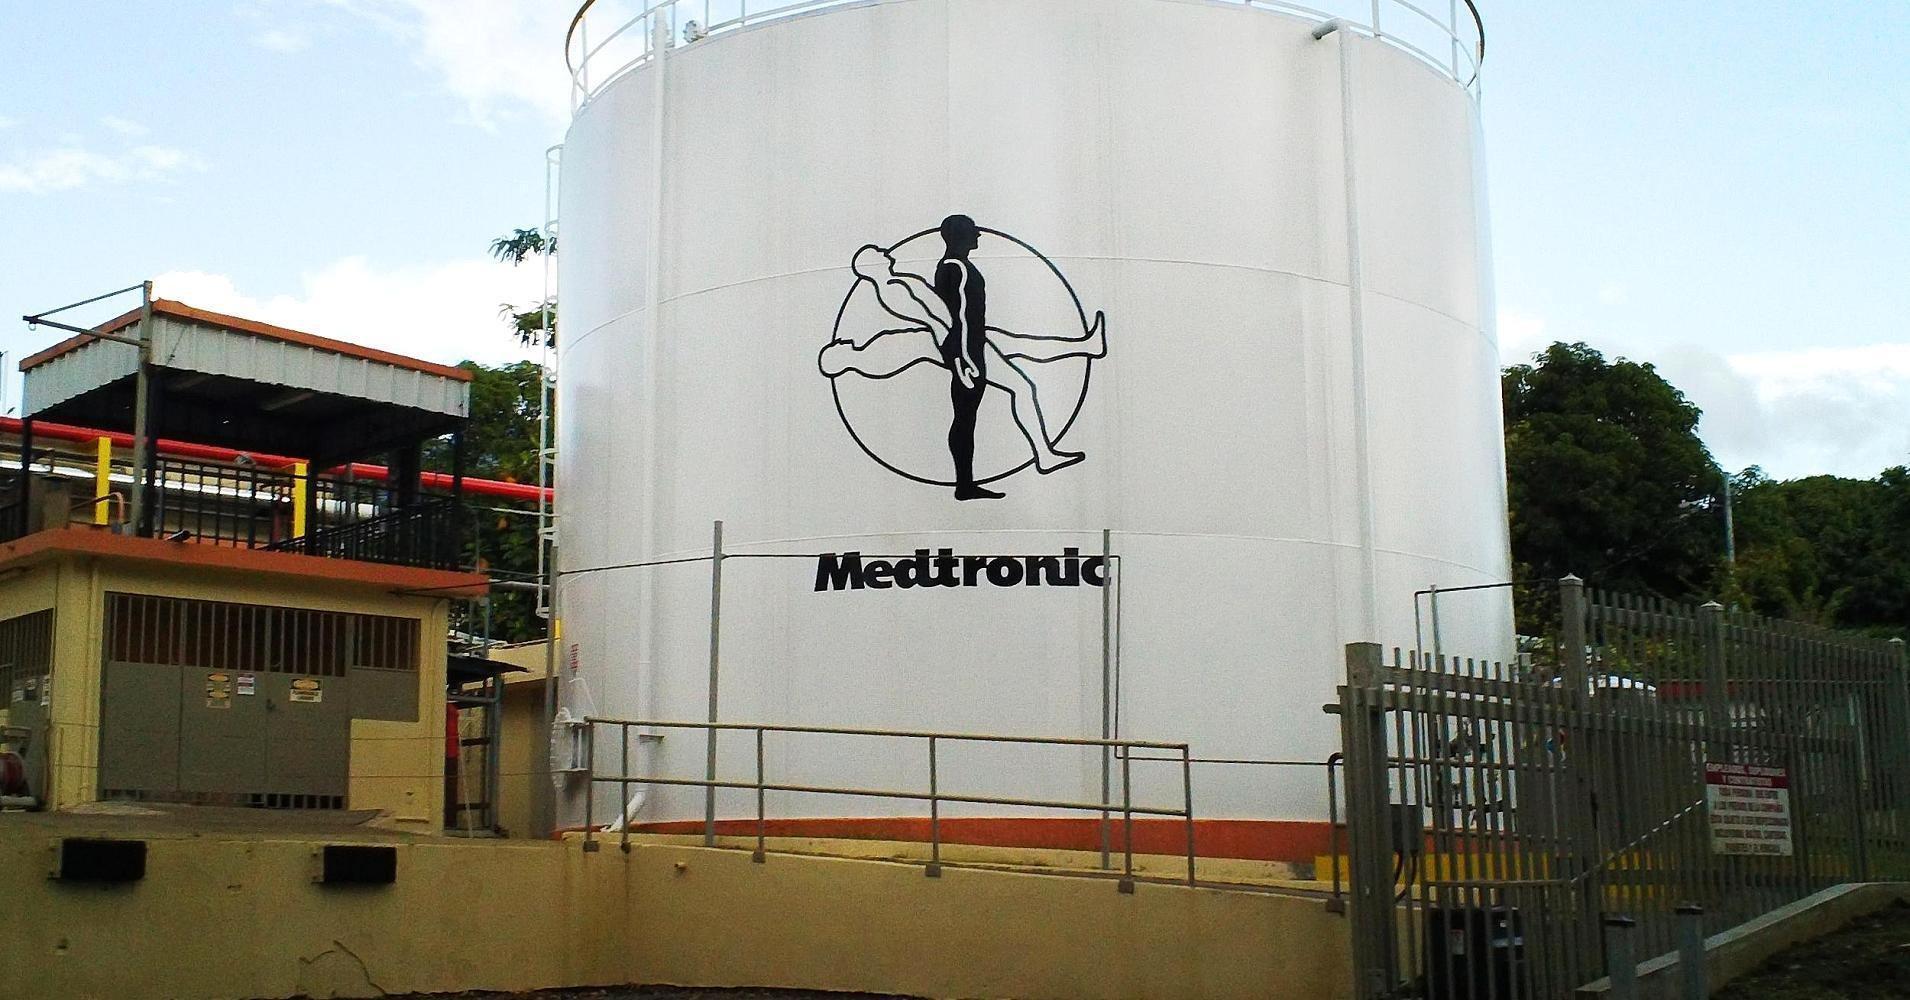 Medtronics $43bn Covidien Deal And Irish Tax Move